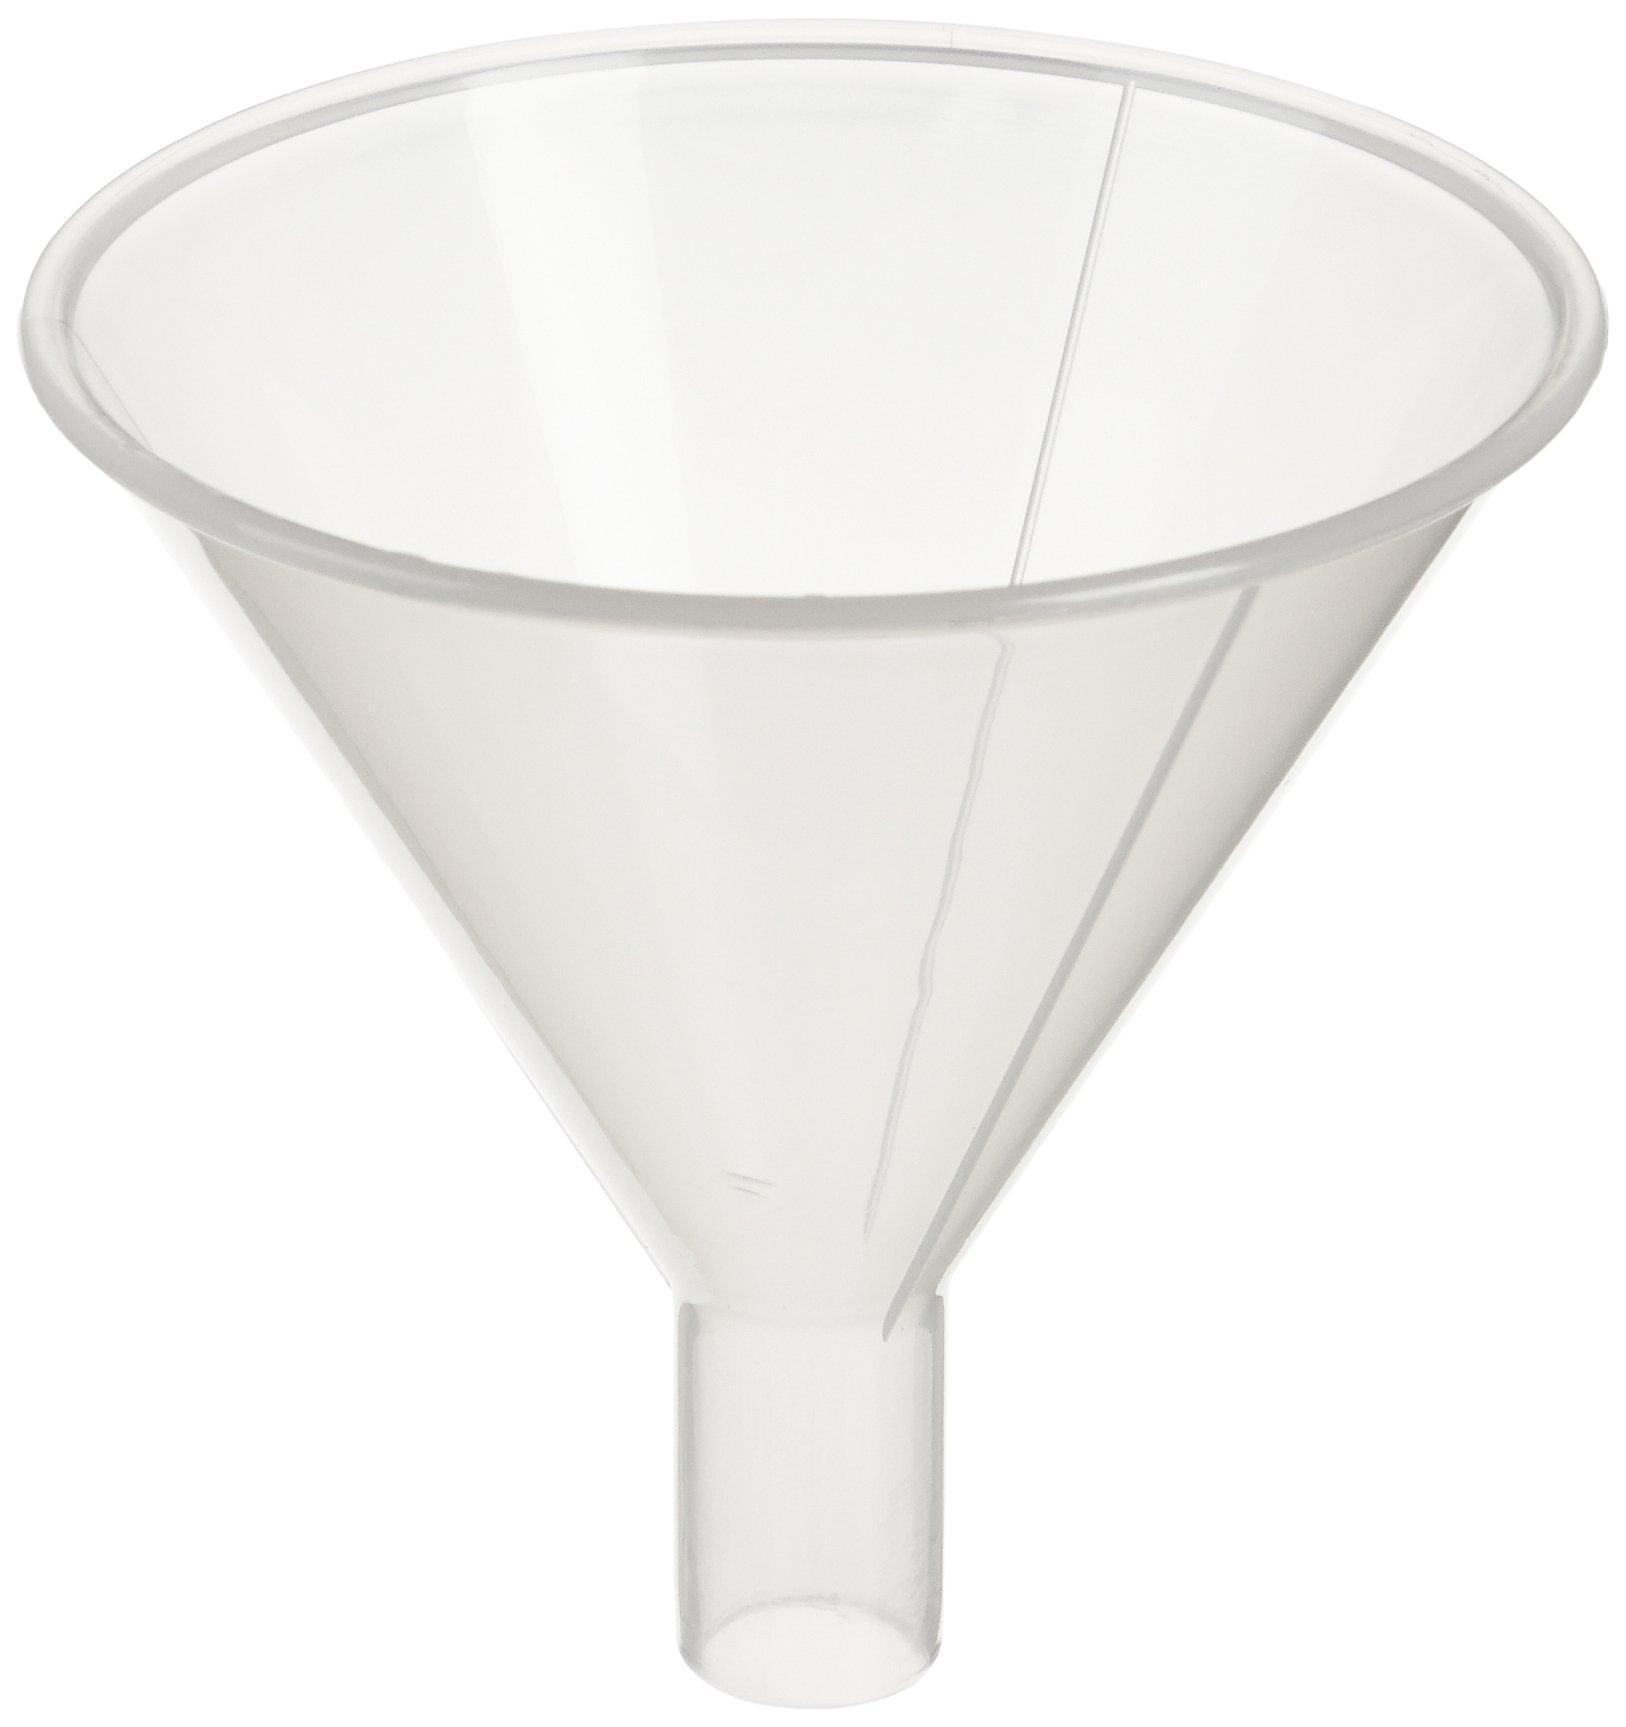 Globe Scientific 600167 Polypropylene Powder Funnel, 80mm Funnel Size, 80mm Top Diameter (Pack of 20)